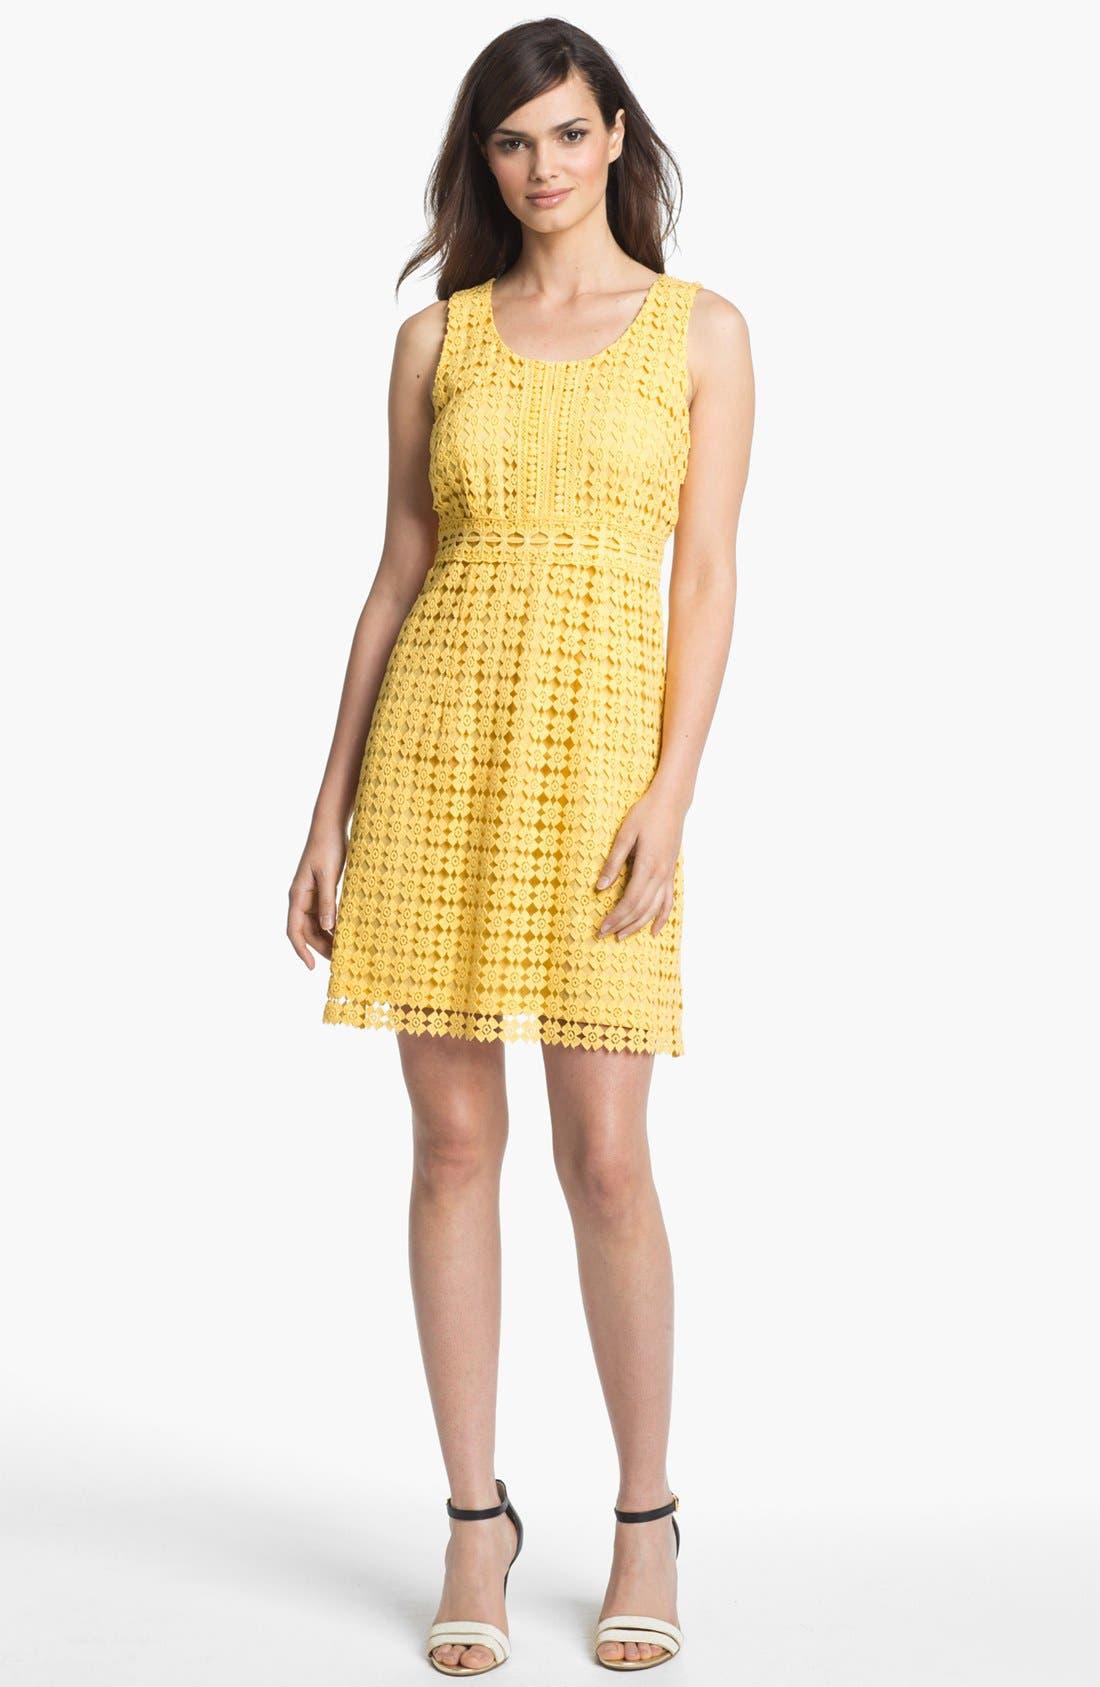 Main Image - Laundry by Shelli Segal Sleeveless Lace Cotton Dress